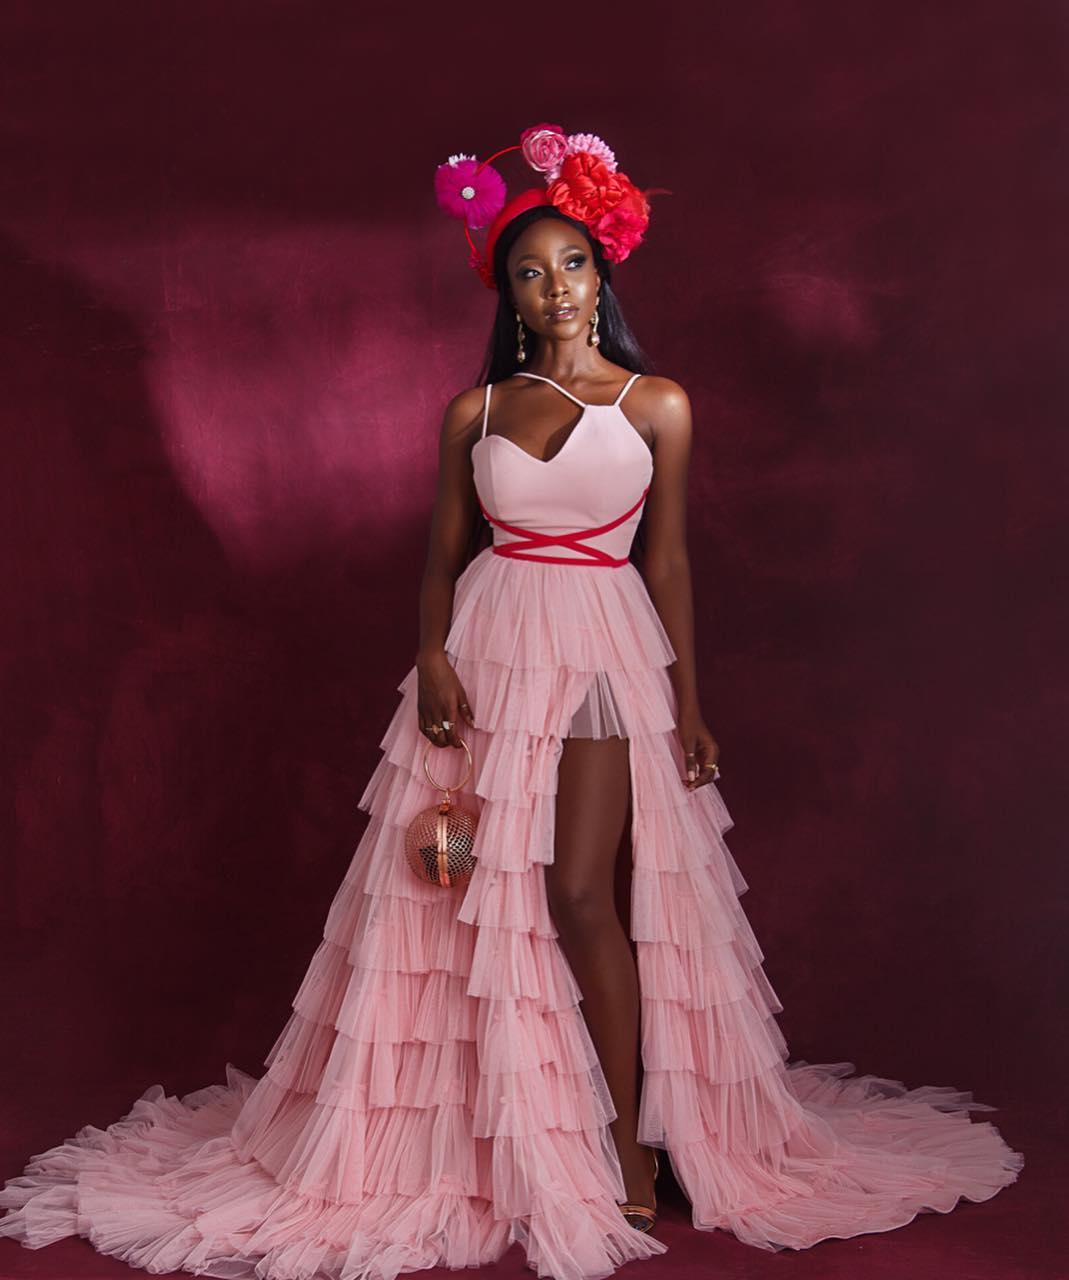 34429082_186244122214797_5060162234278215680_n Toke Makinwa, Osas Ighodaro Ajibade, Ini Dima-Okojie at the MET Gala themed #Oceans8 Premiere Events Fashion